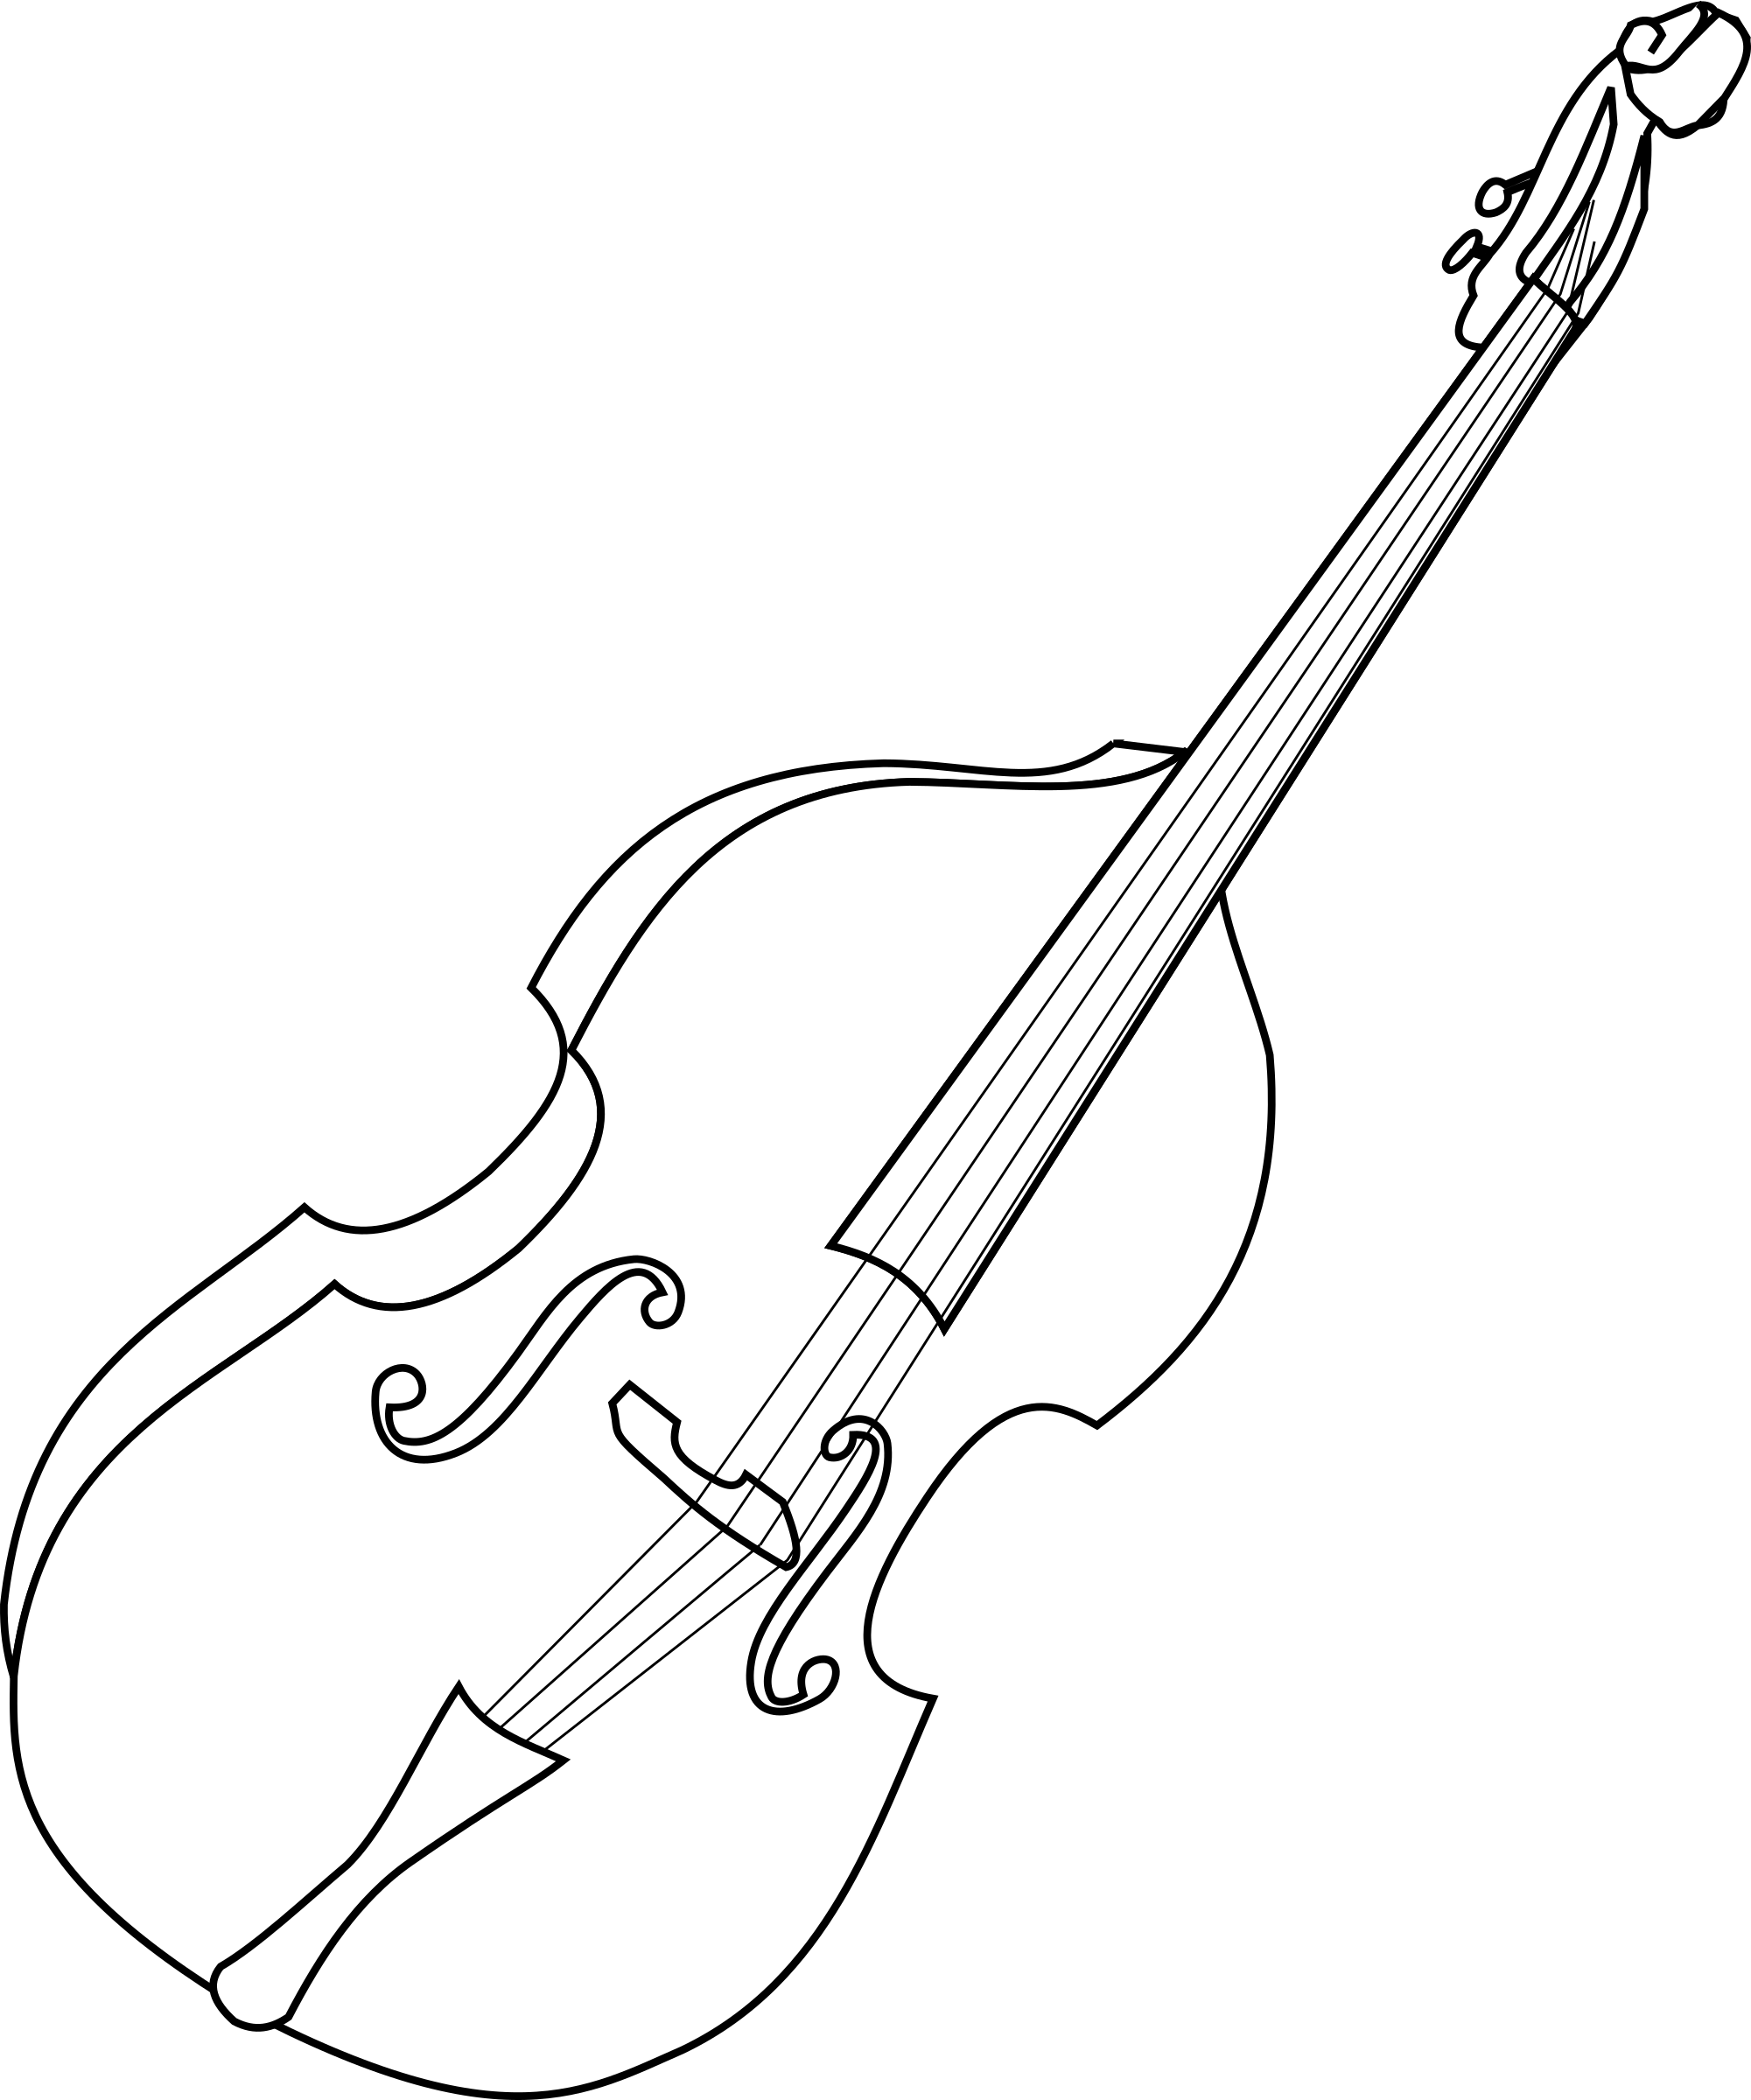 Upright bass clipart philip martin vector royalty free library Bass clipart upright bass, Bass upright bass Transparent ... vector royalty free library